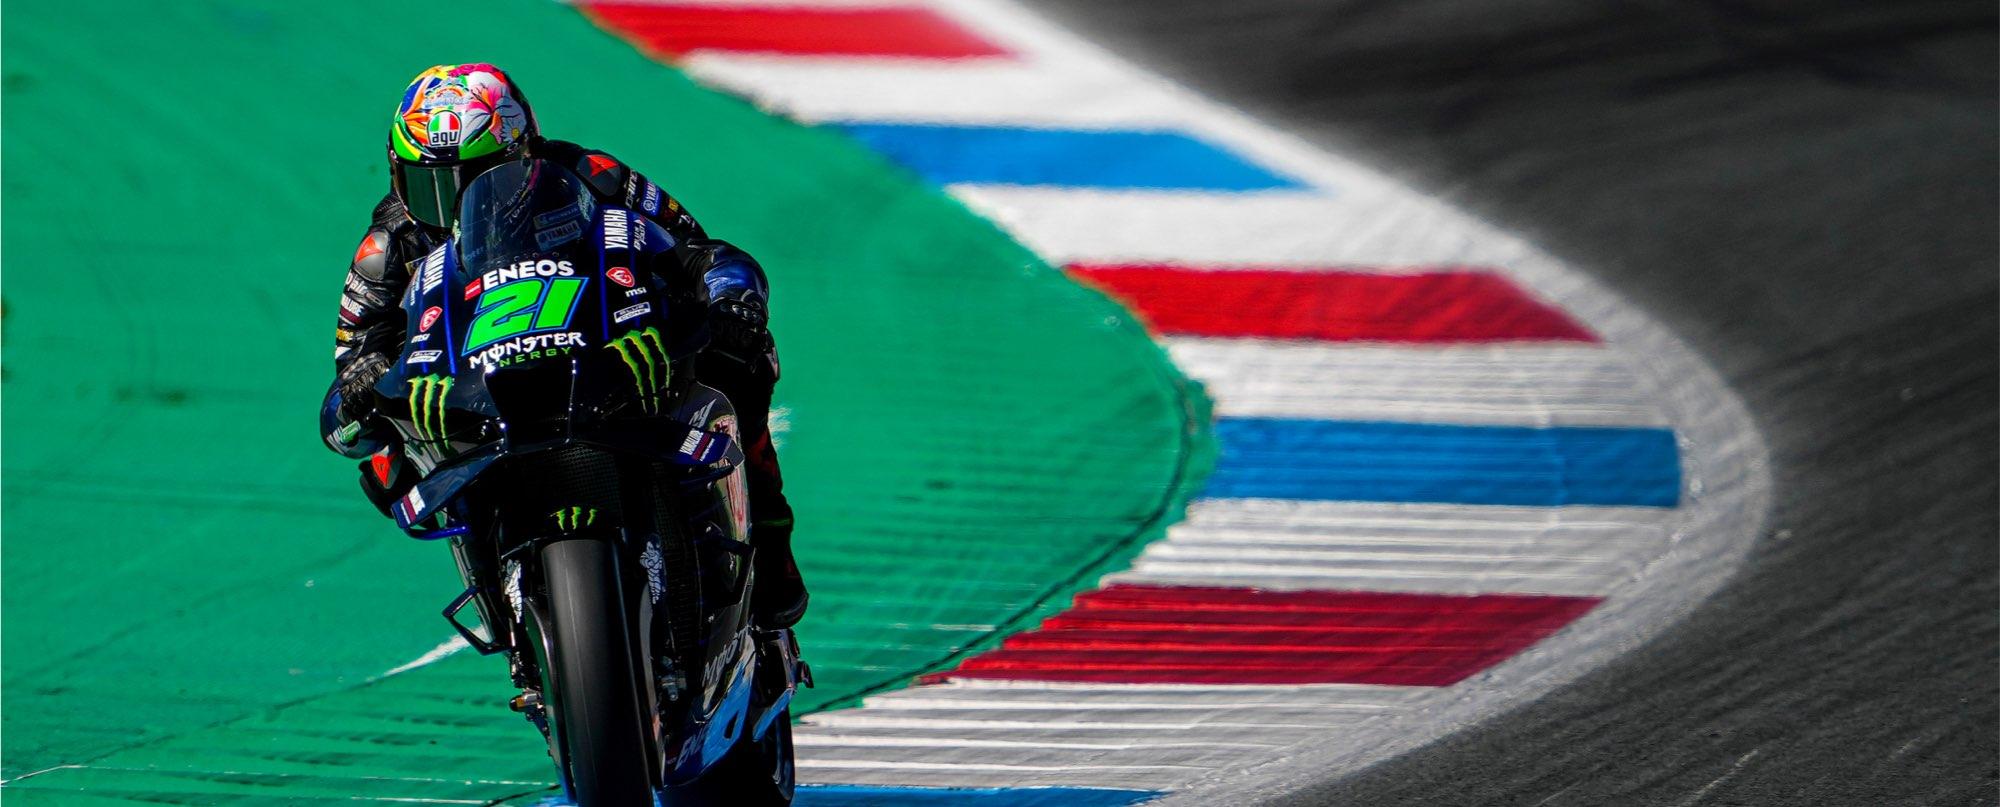 2018 MotoGP tests